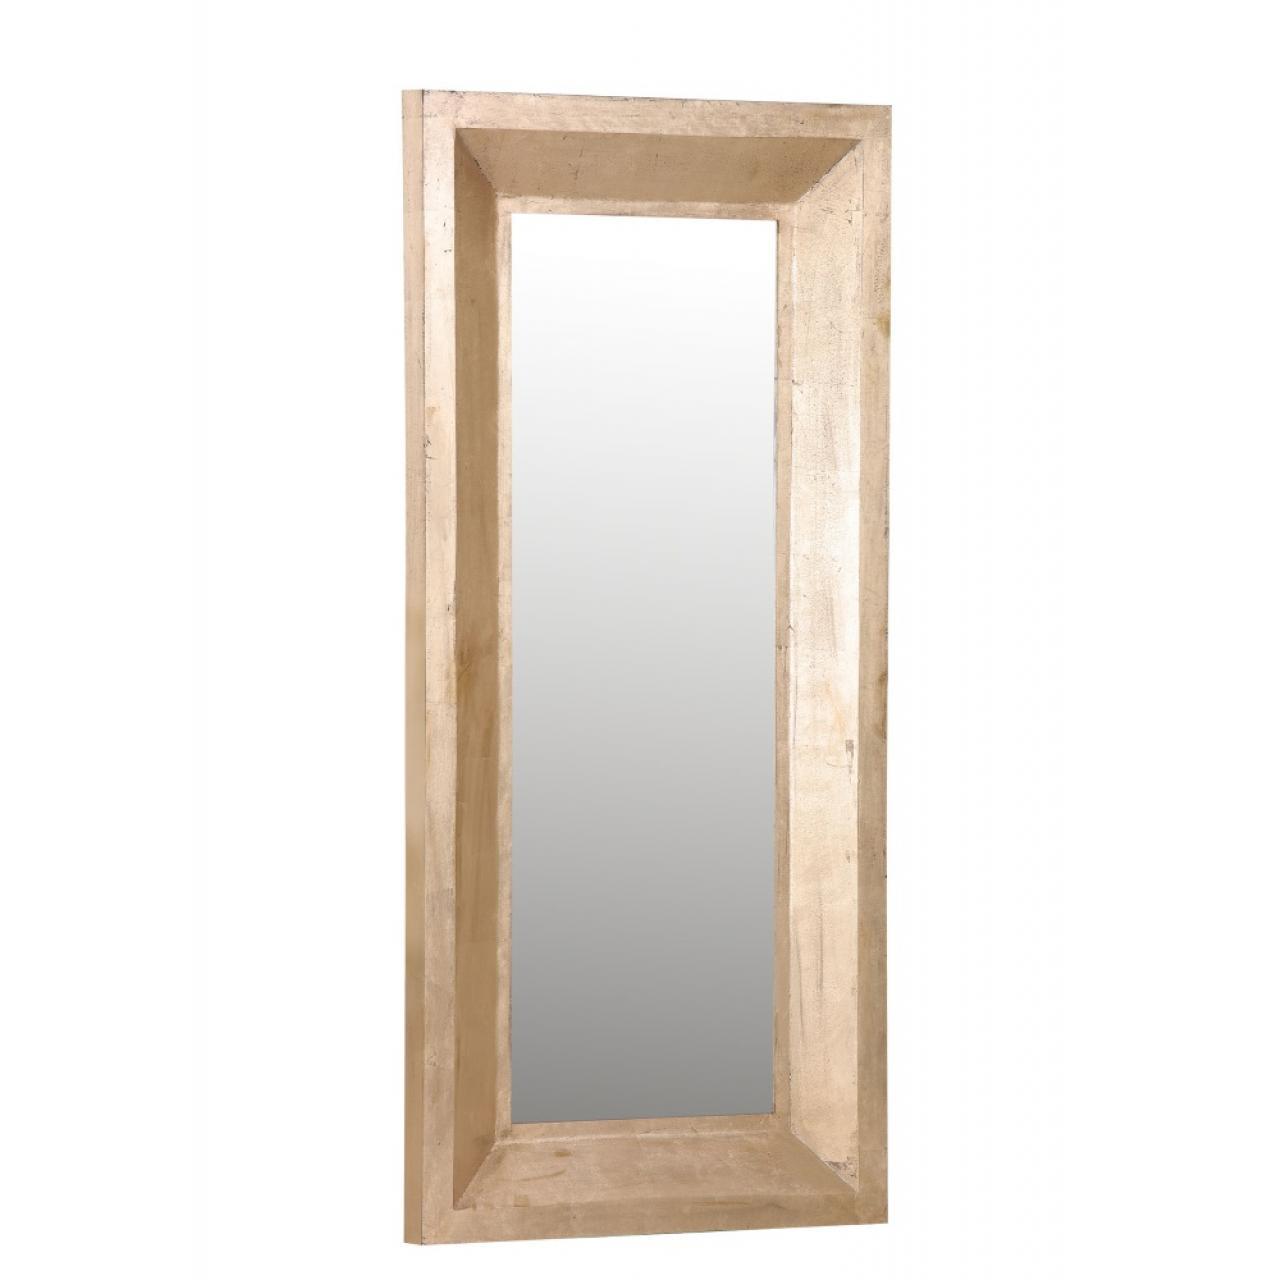 Spiegel Reflection Gold Wandspiegel Badezimmer Dielenspiegel Flurspiegel 150x70